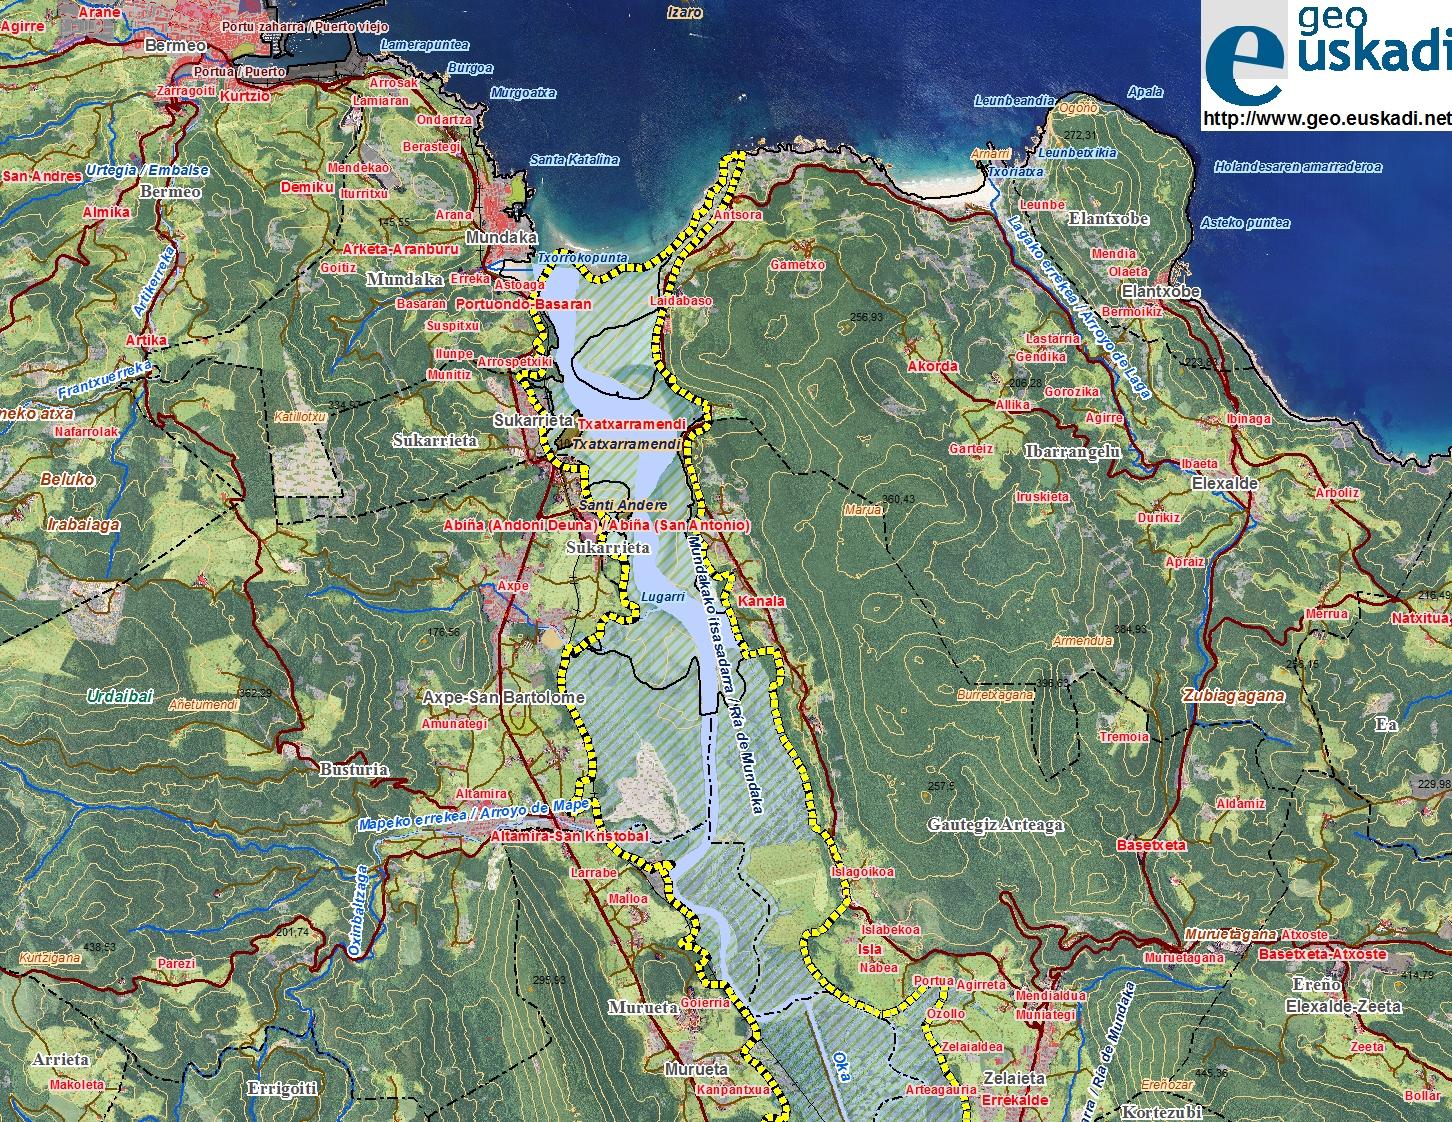 gobierno_vasco_unesco_analizan_urdaibai_proyectos_comunicacion_para_reservas_biosfera_europa.jpg